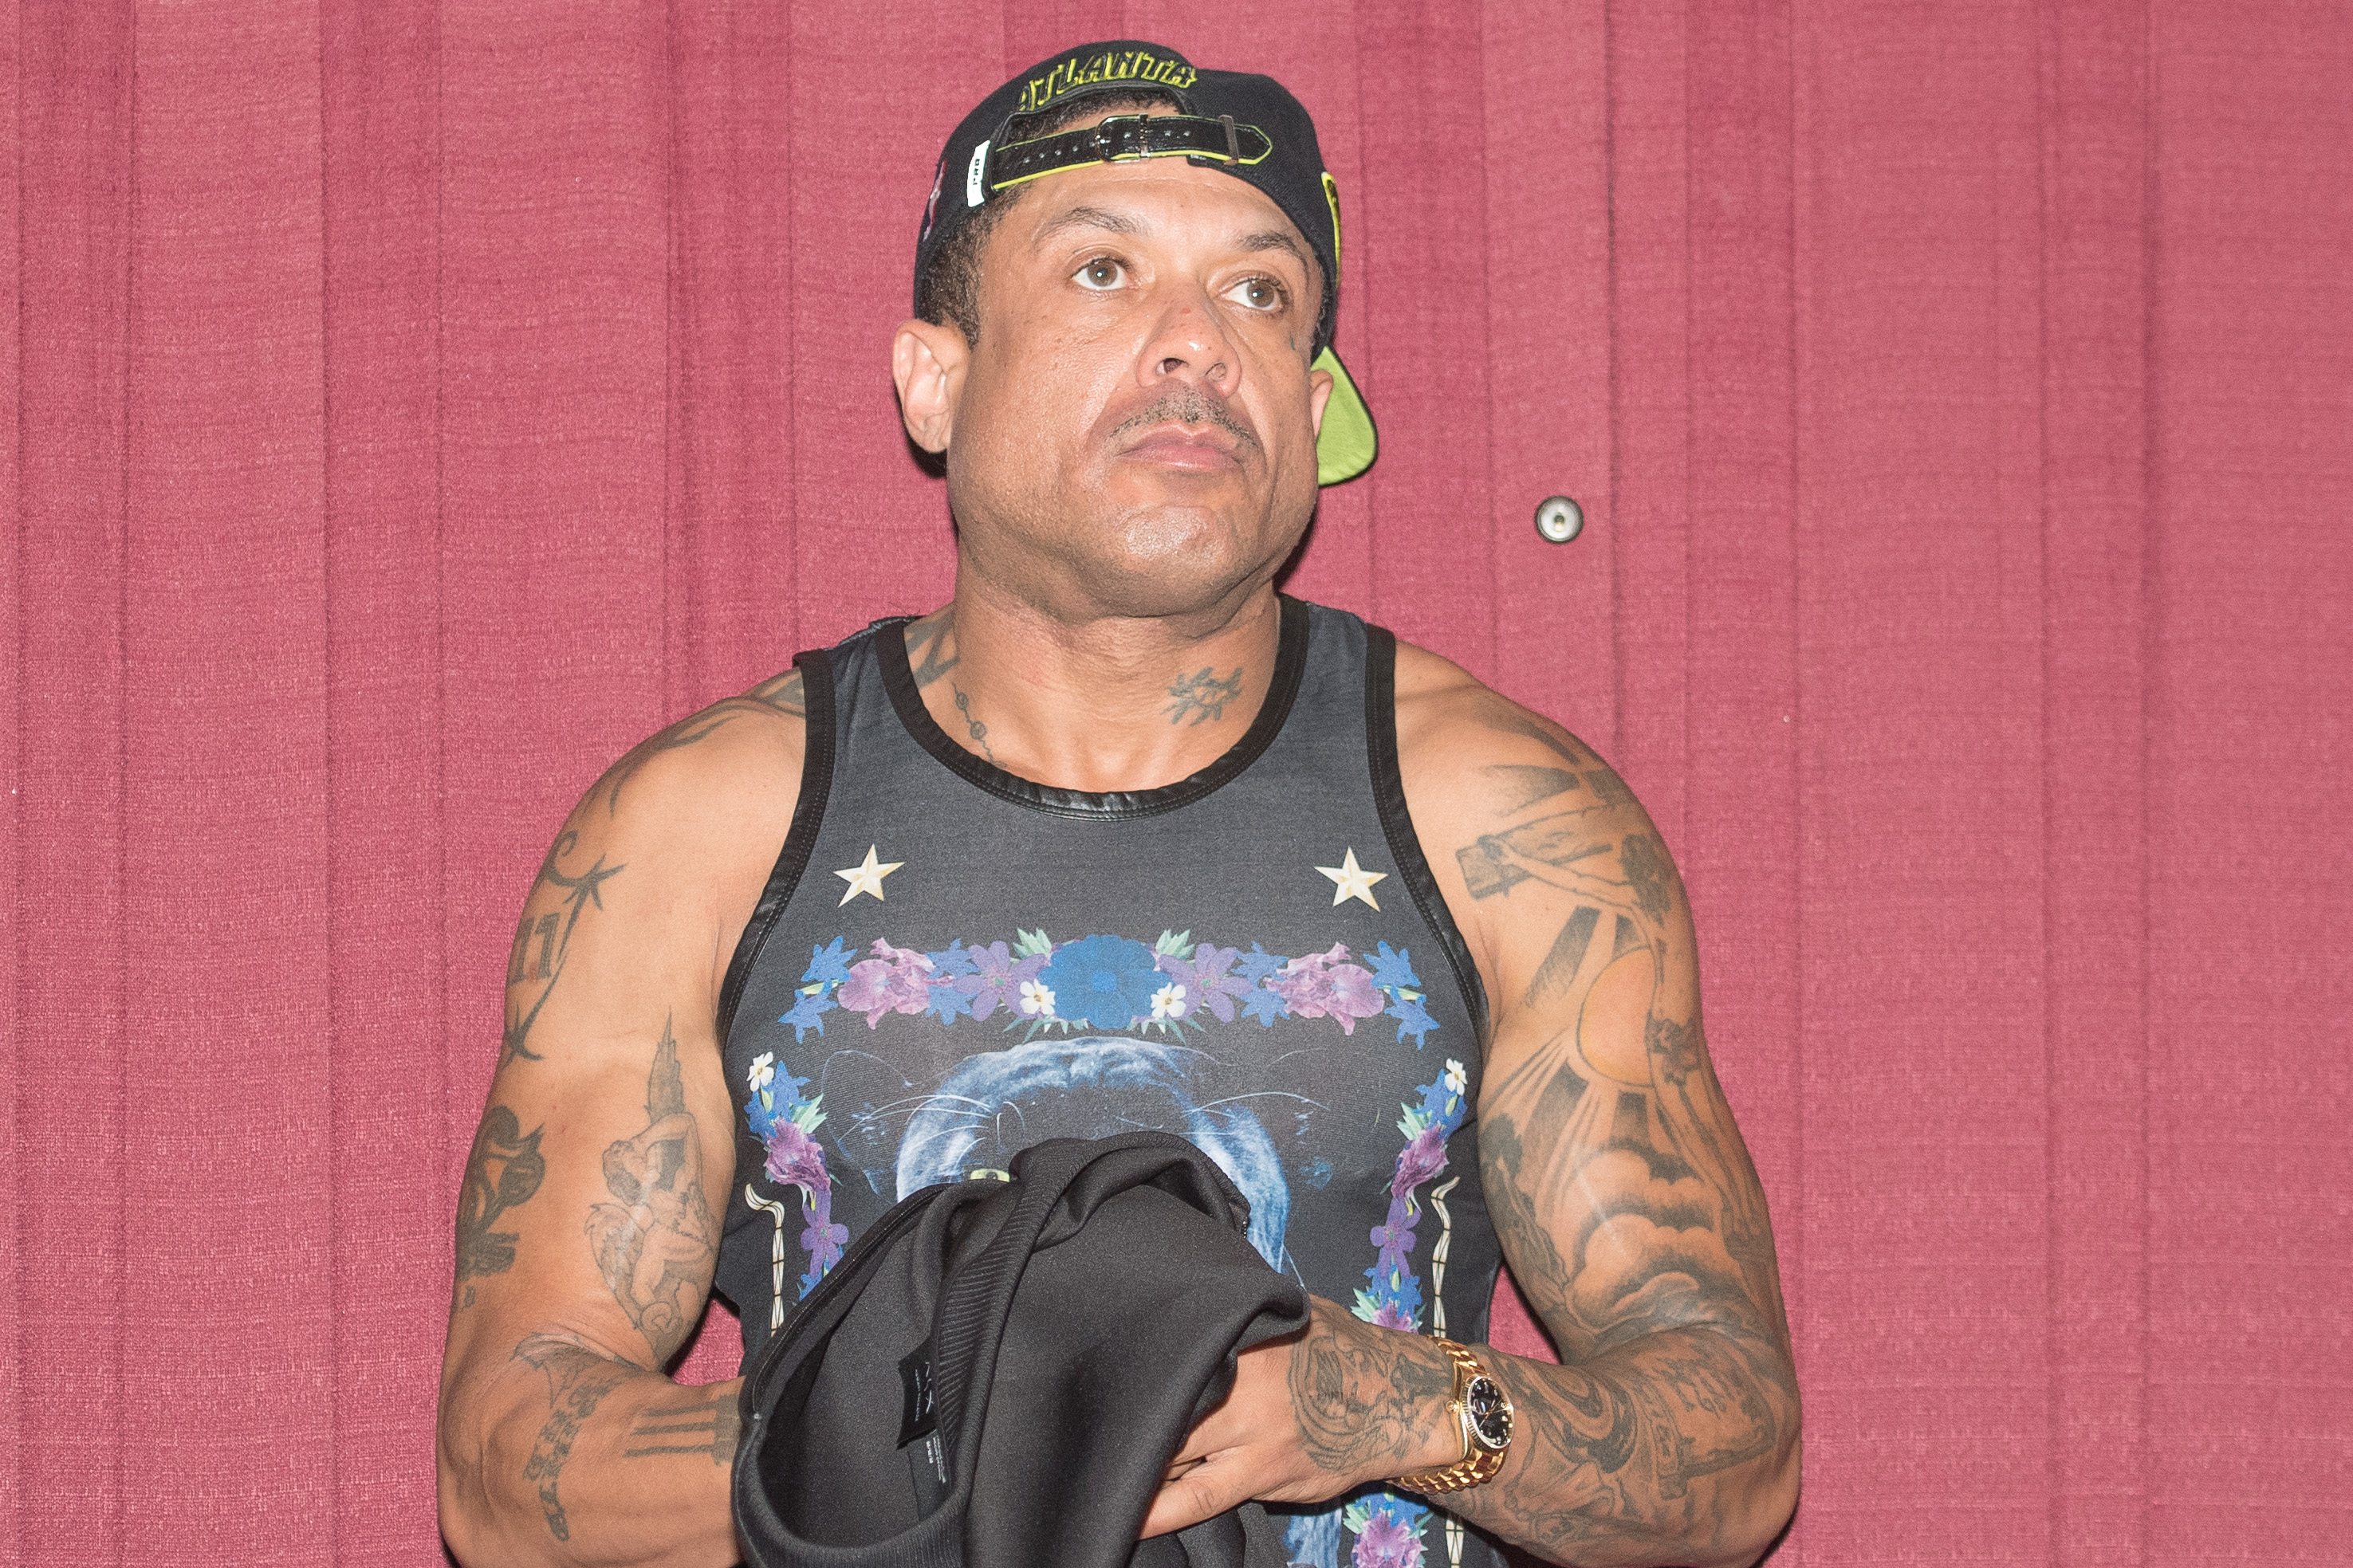 Ex-LHHATL Star Benzino Has Meltdown during Arrest, Curses out Female Cop